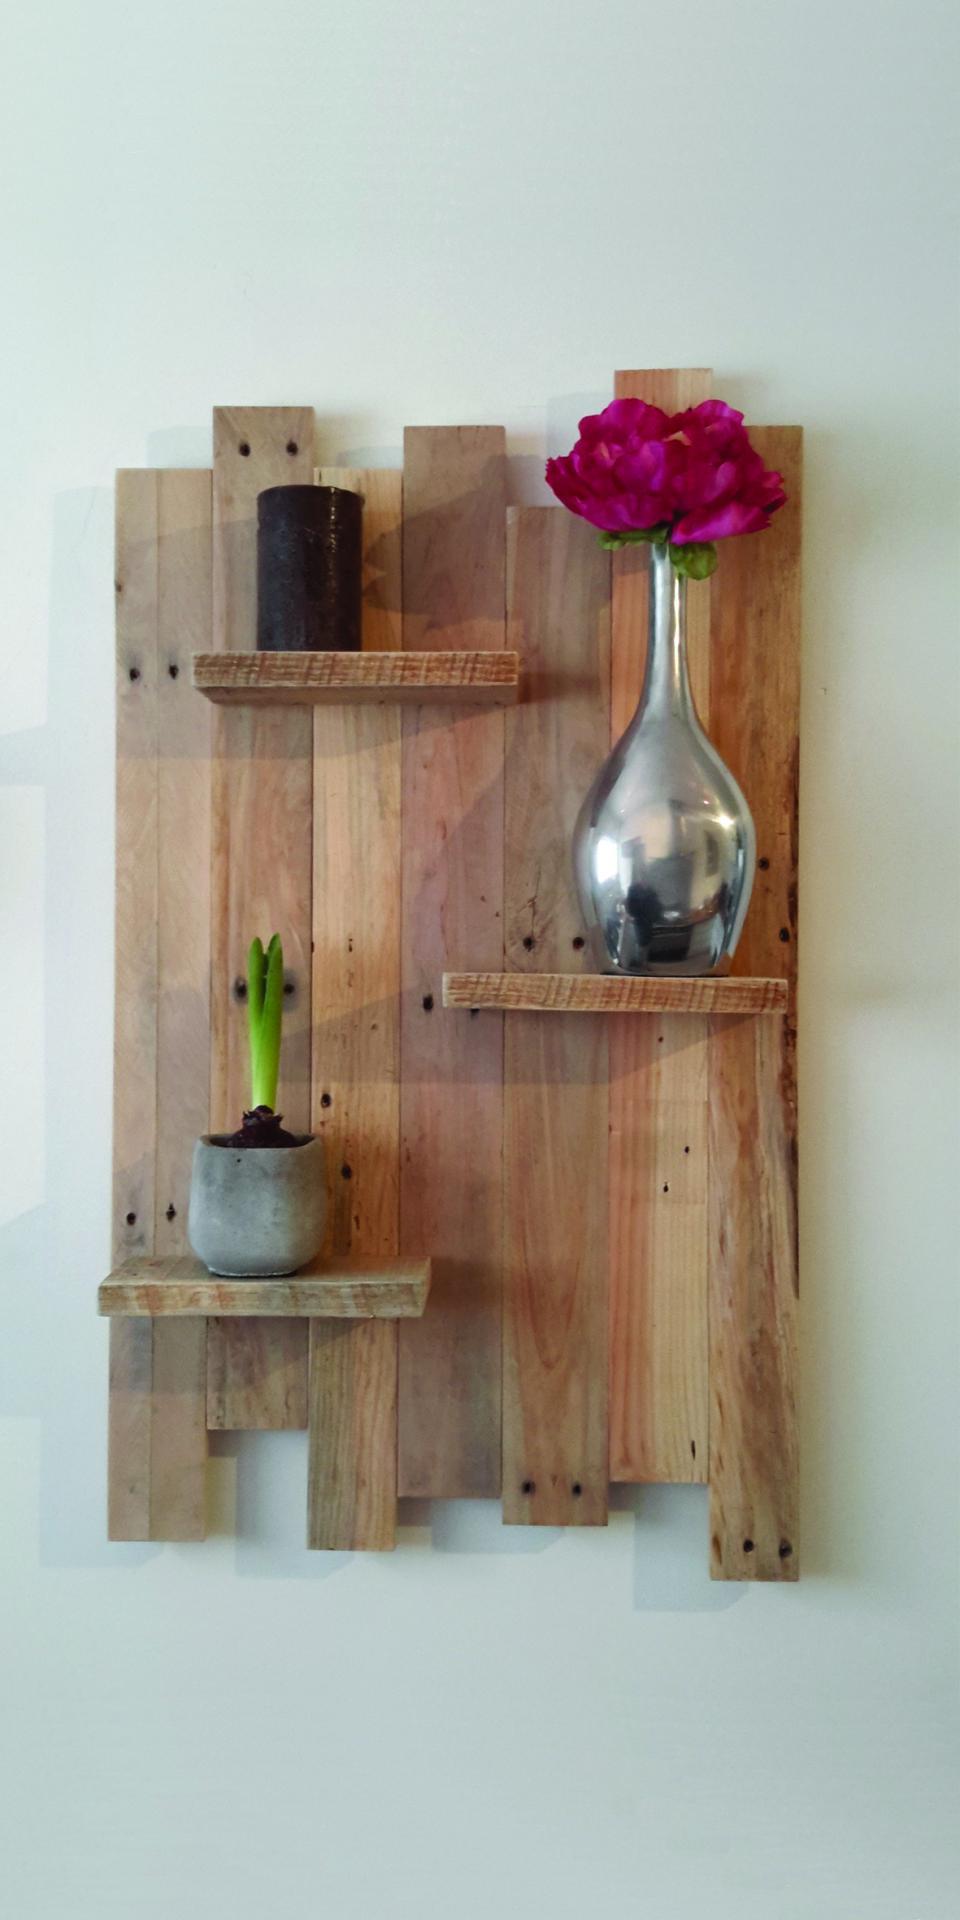 etag re murale. Black Bedroom Furniture Sets. Home Design Ideas